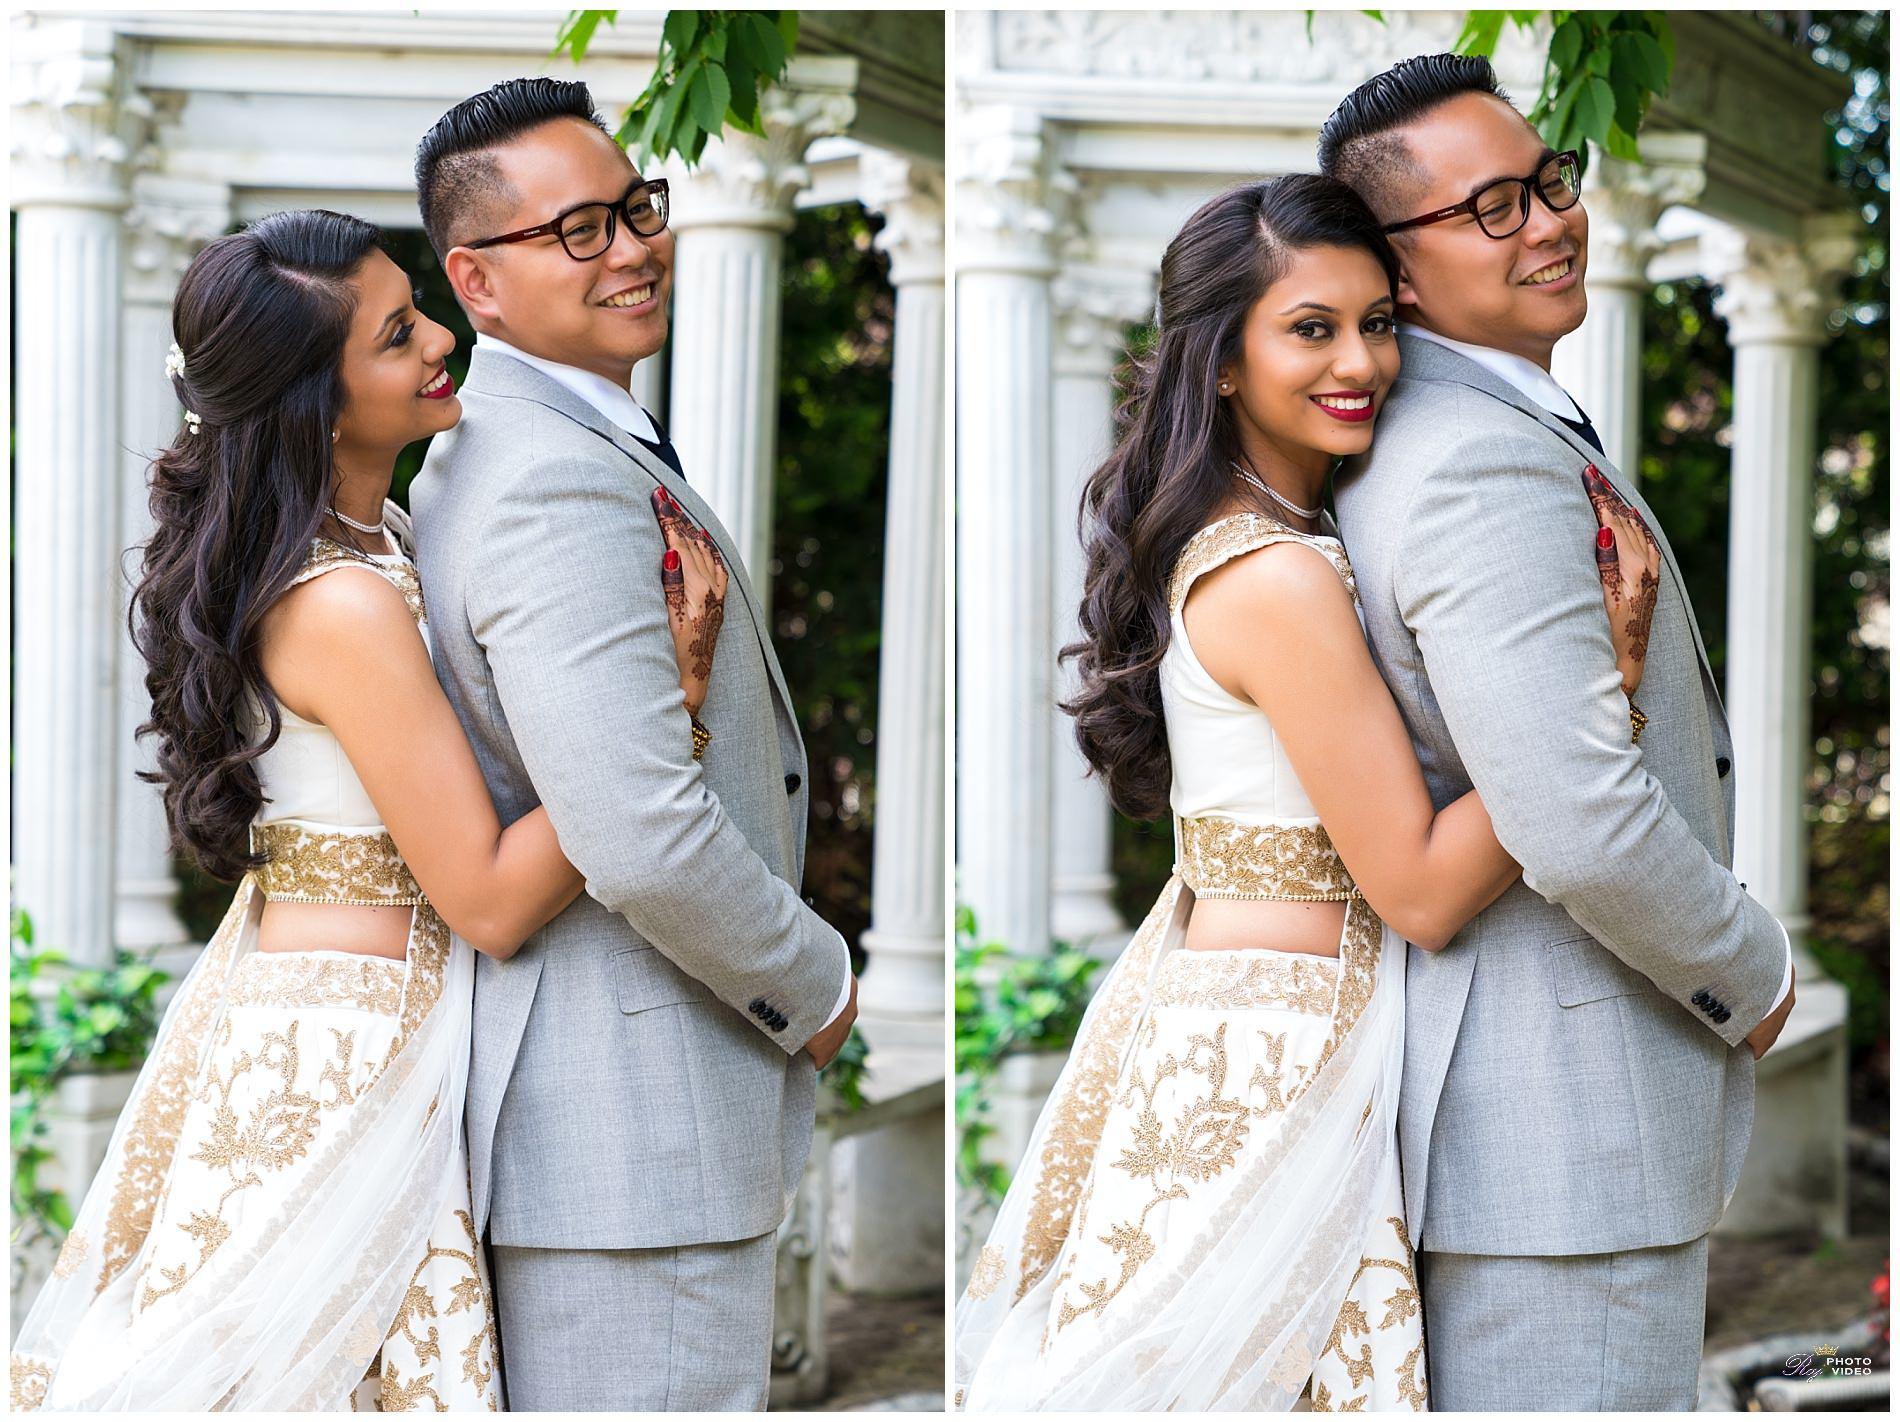 Royal-Manor-Garfield-NJ-Christian-Wedding-Ceremony-Khusbu-Jeff-19.jpg